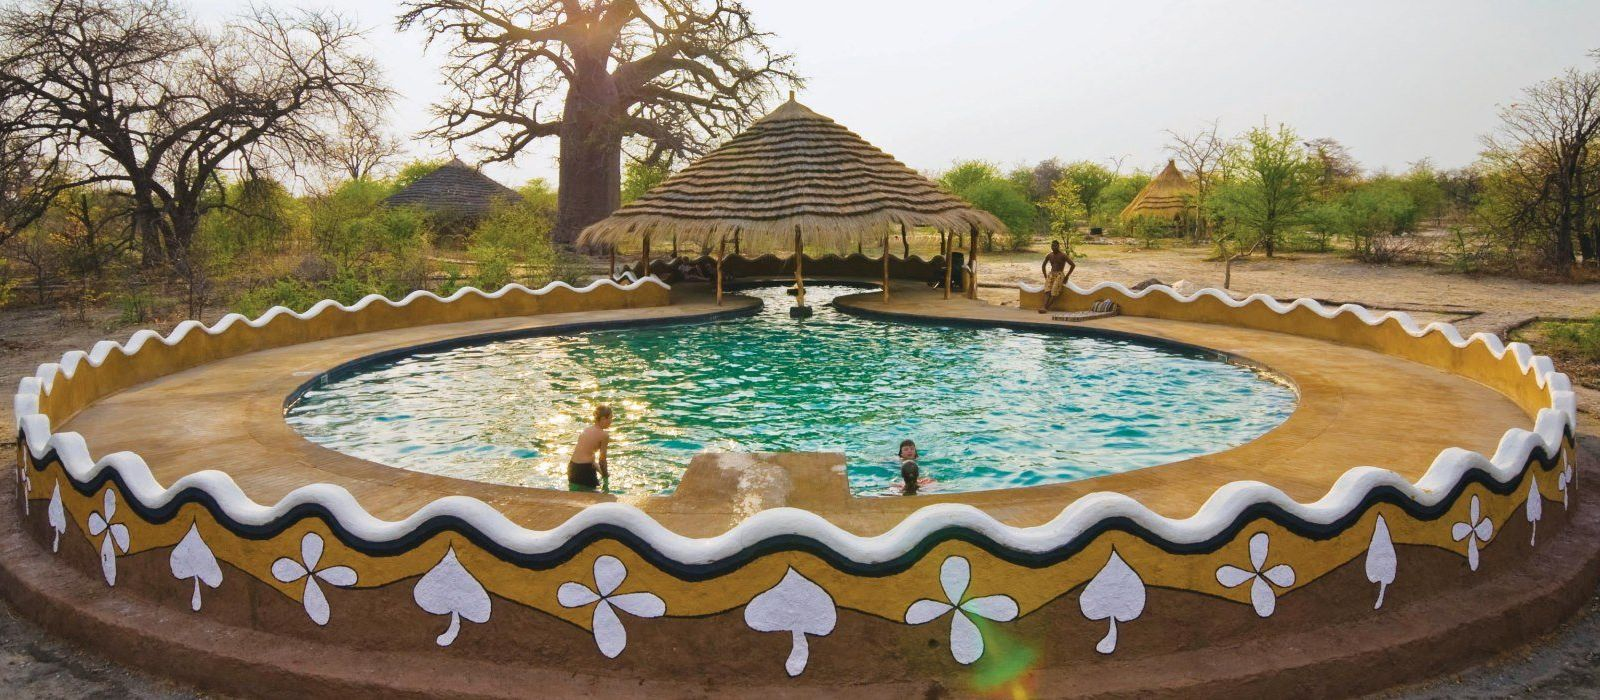 Hotel Planet Baobab Botswana